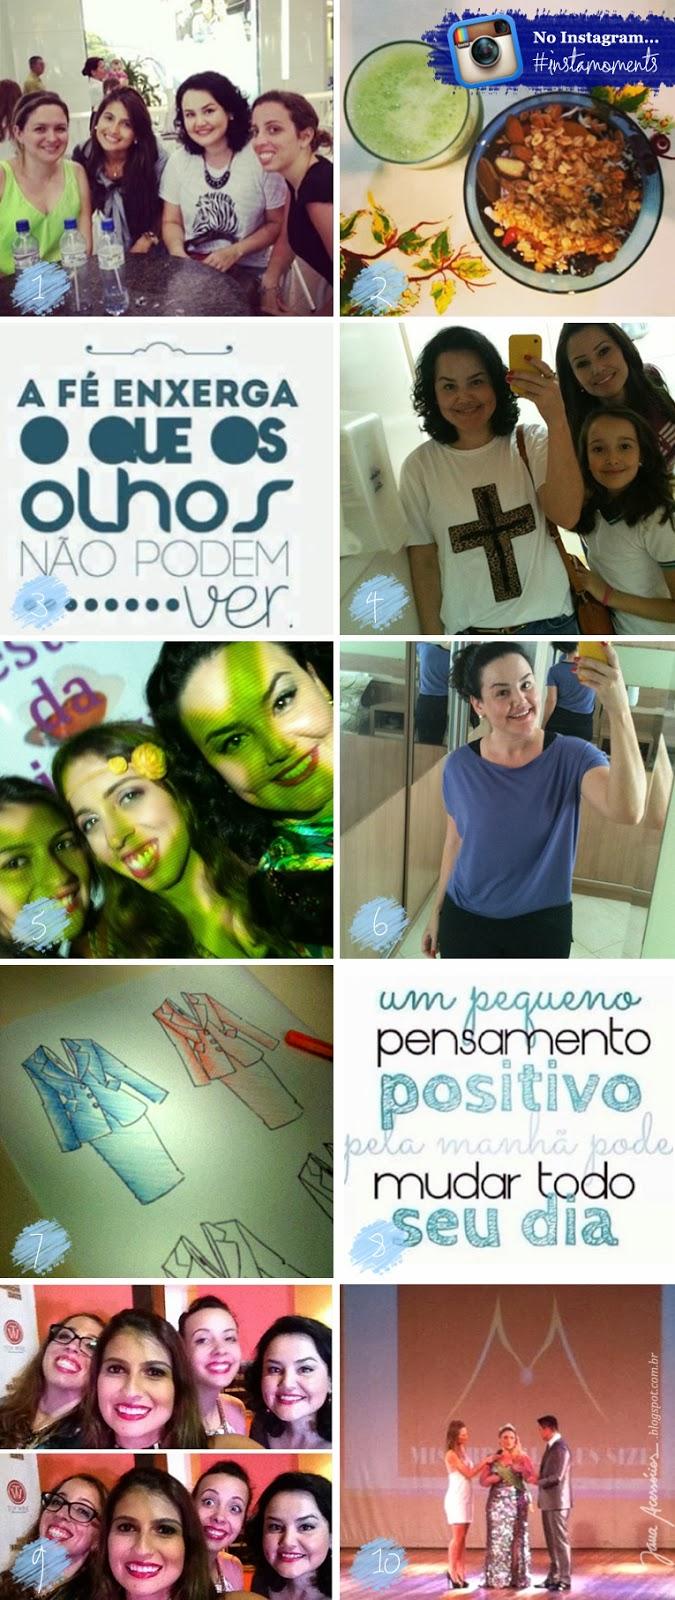 @janaacessorios, momentos, semana, moda, amigas, frases, fashion, evento